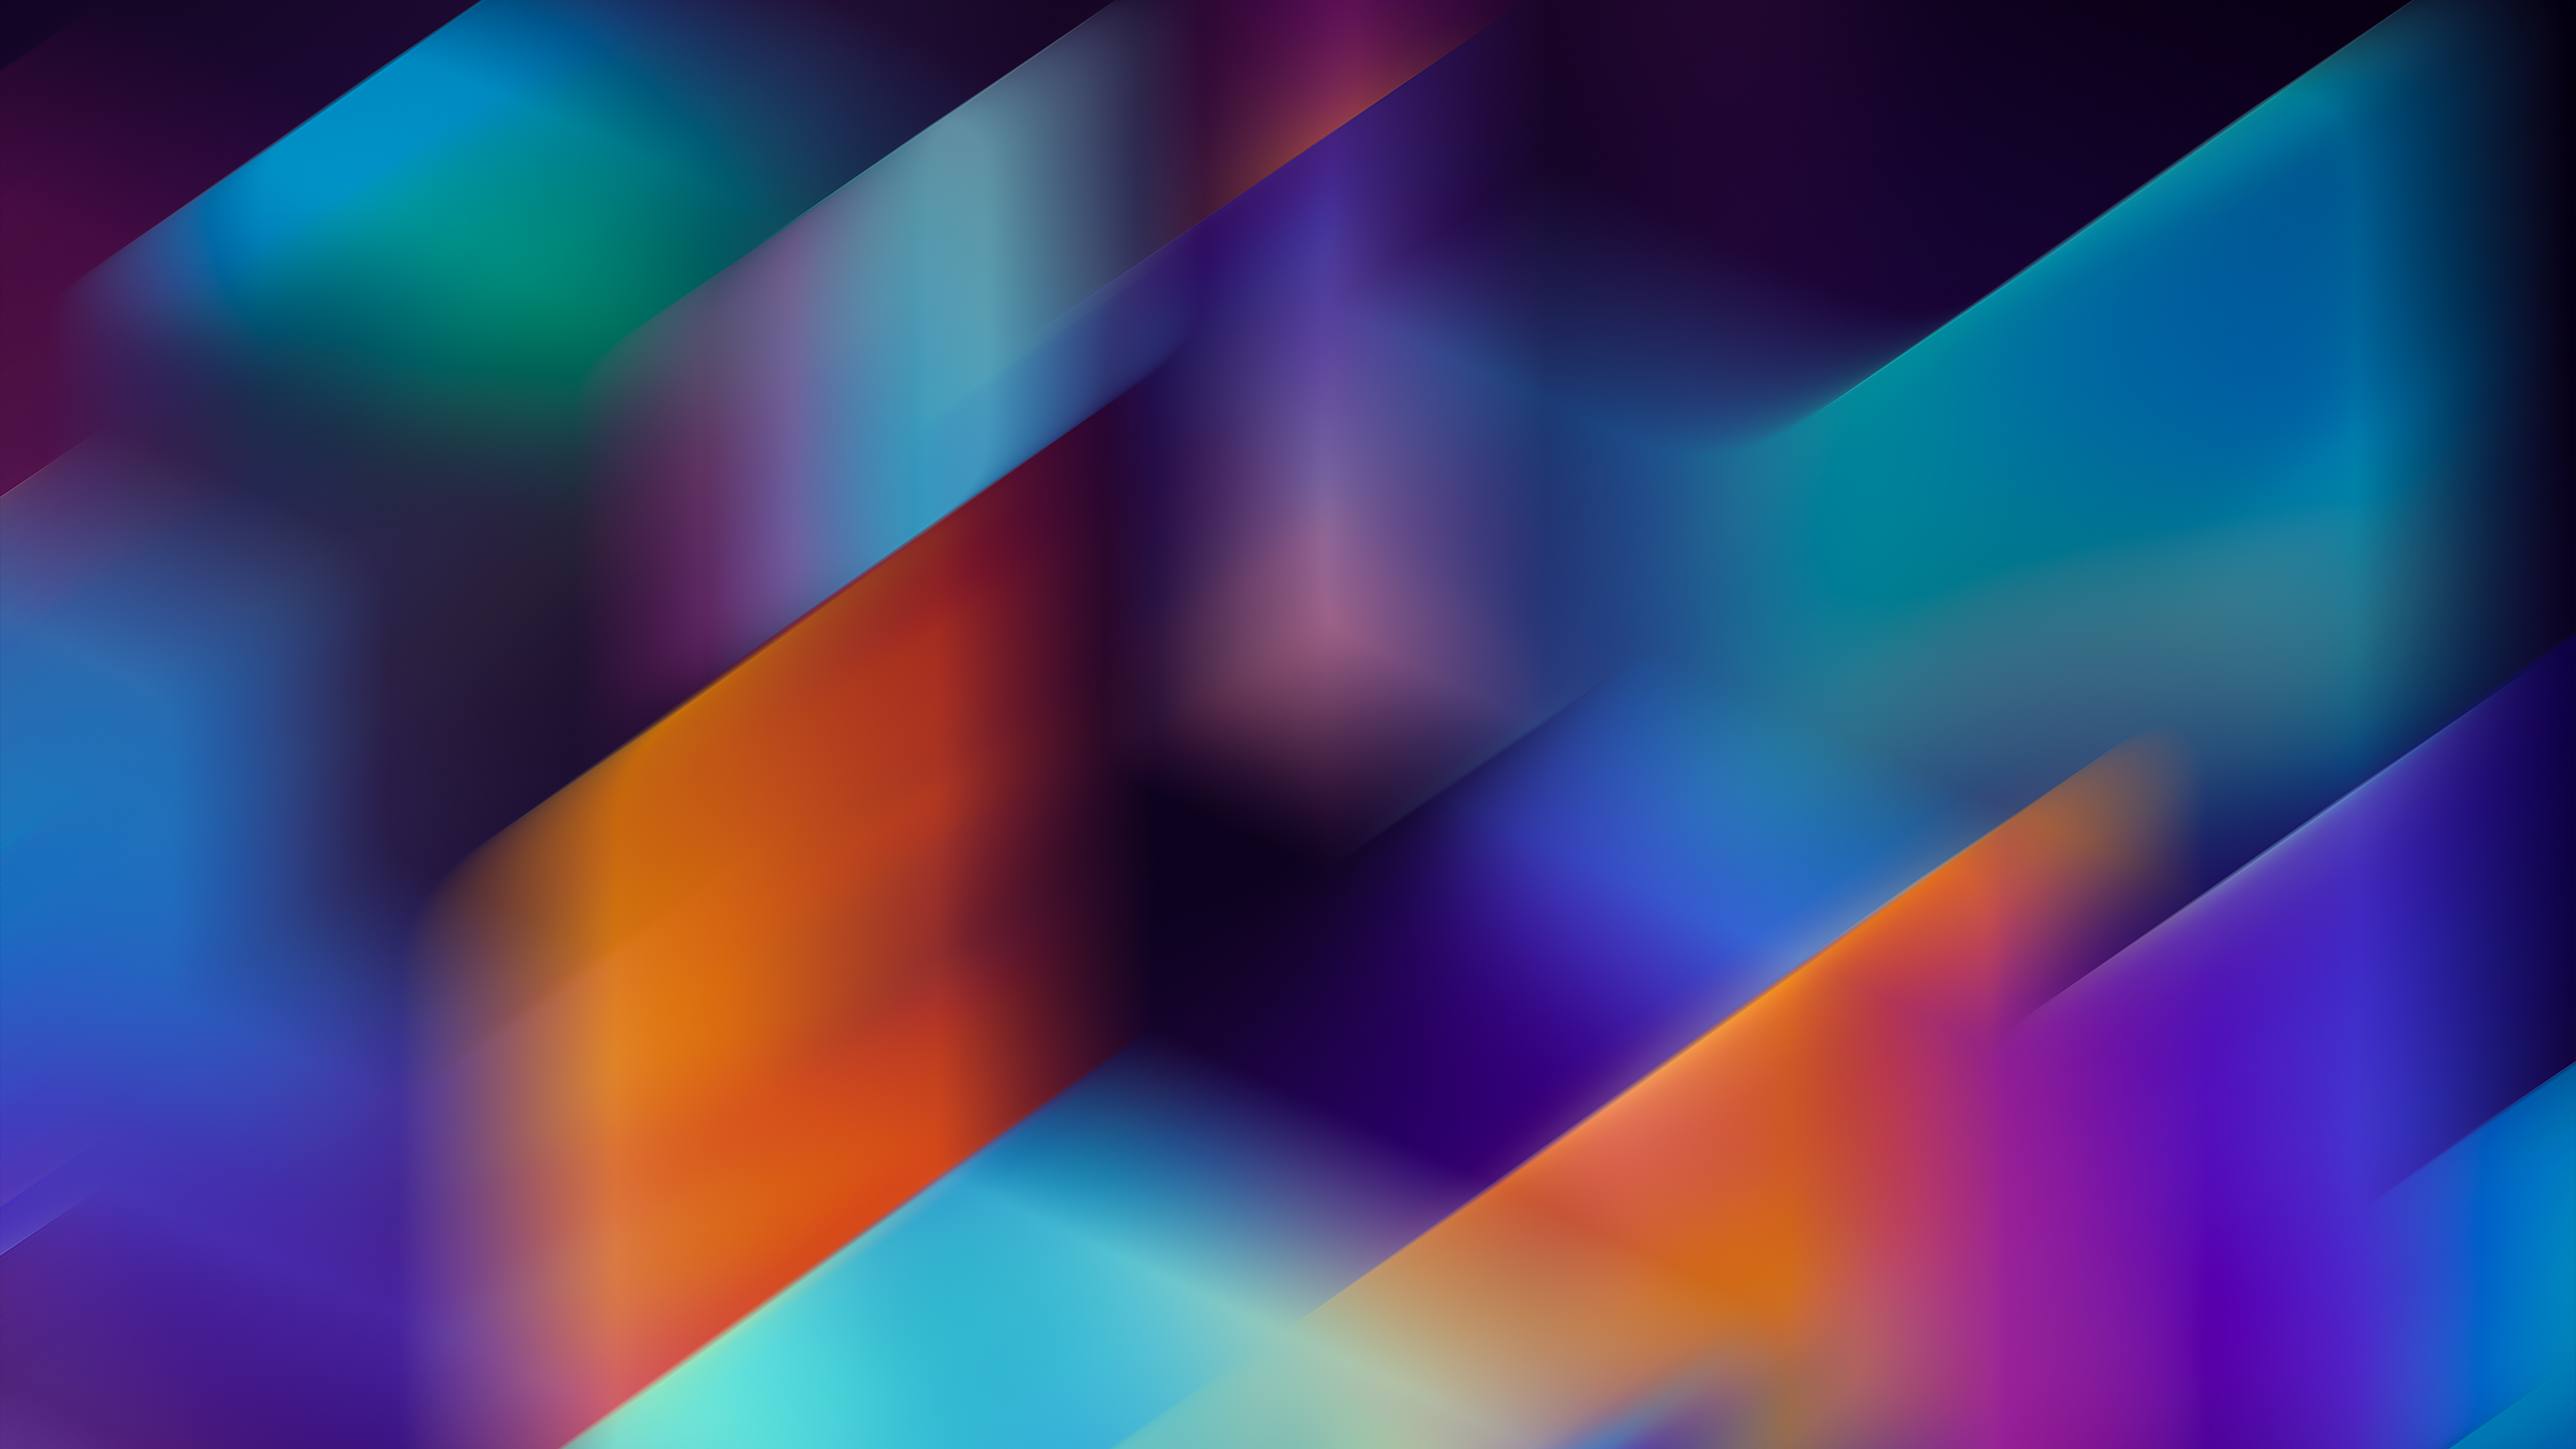 Fondos de pantalla Listones abstractos